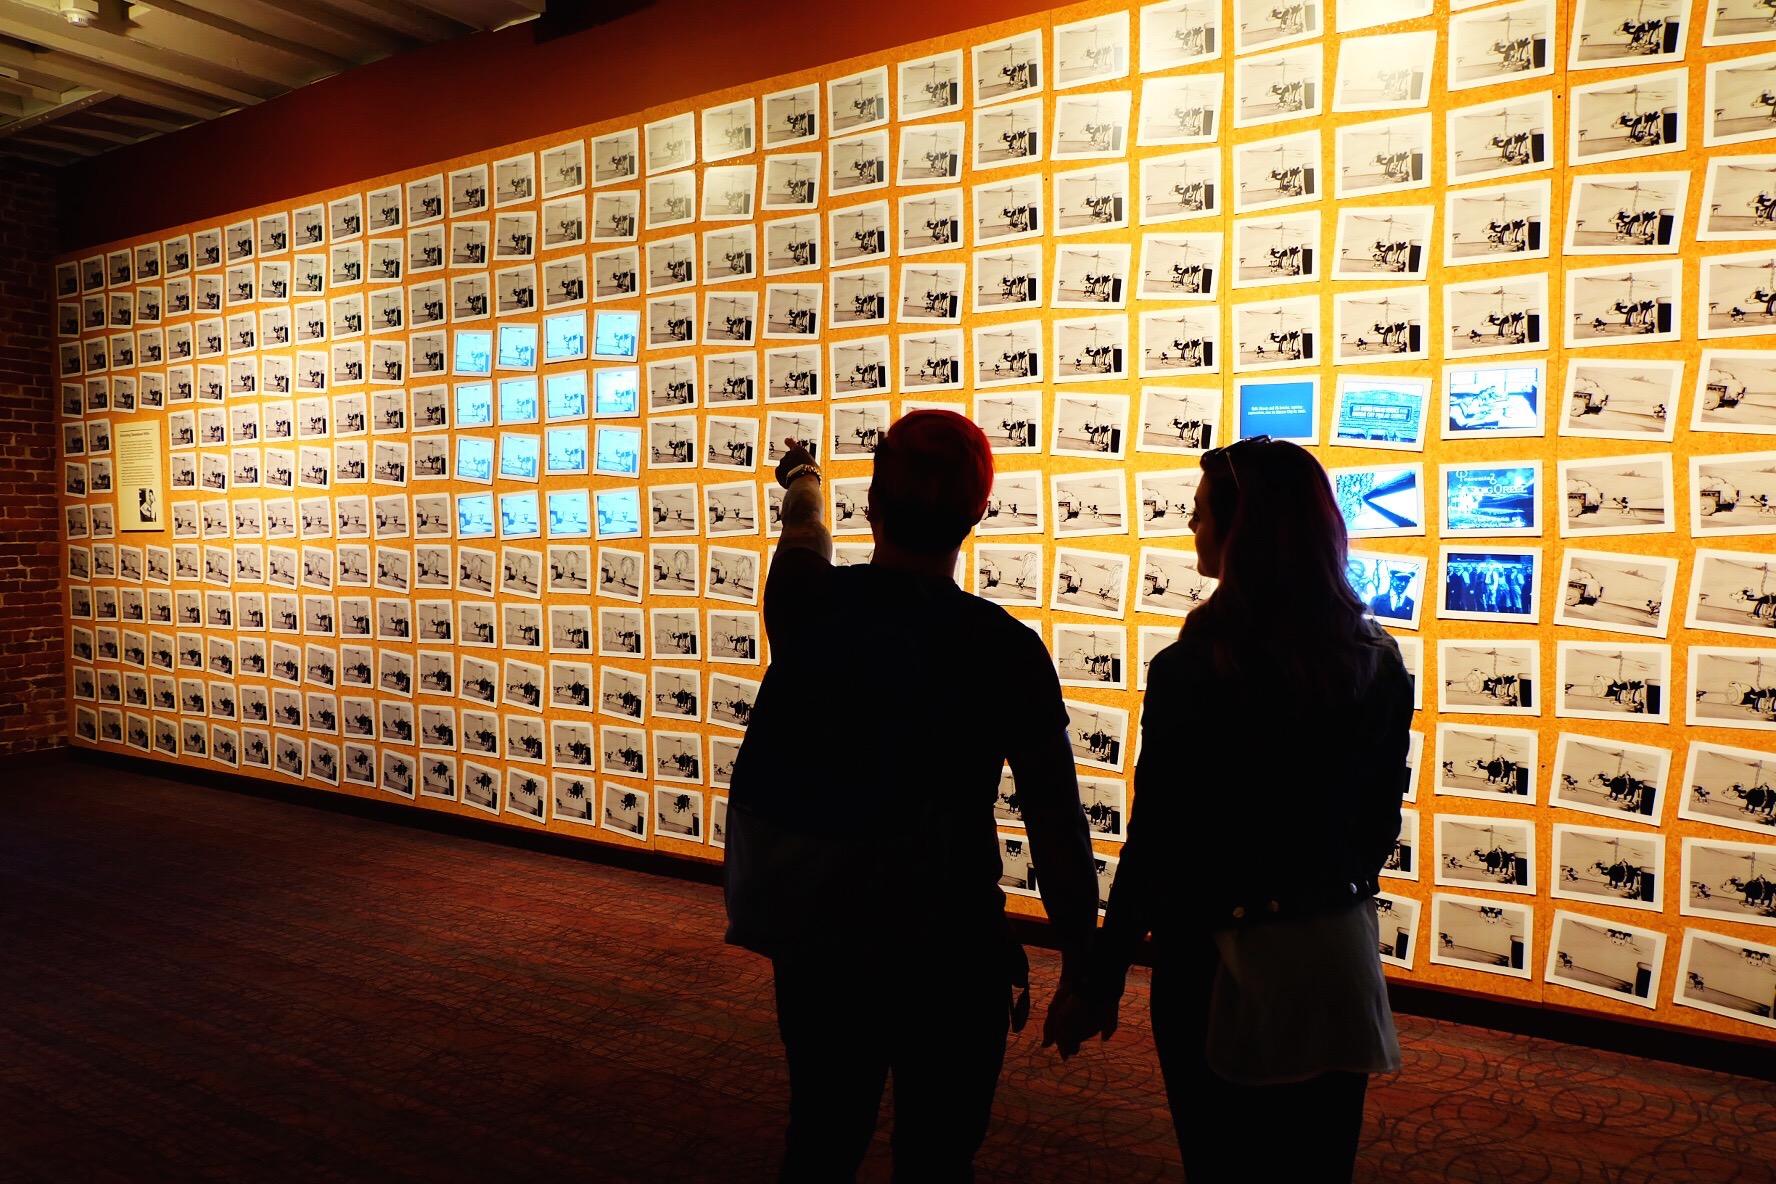 Steamboat Willie stills illuminated across an entire wall.